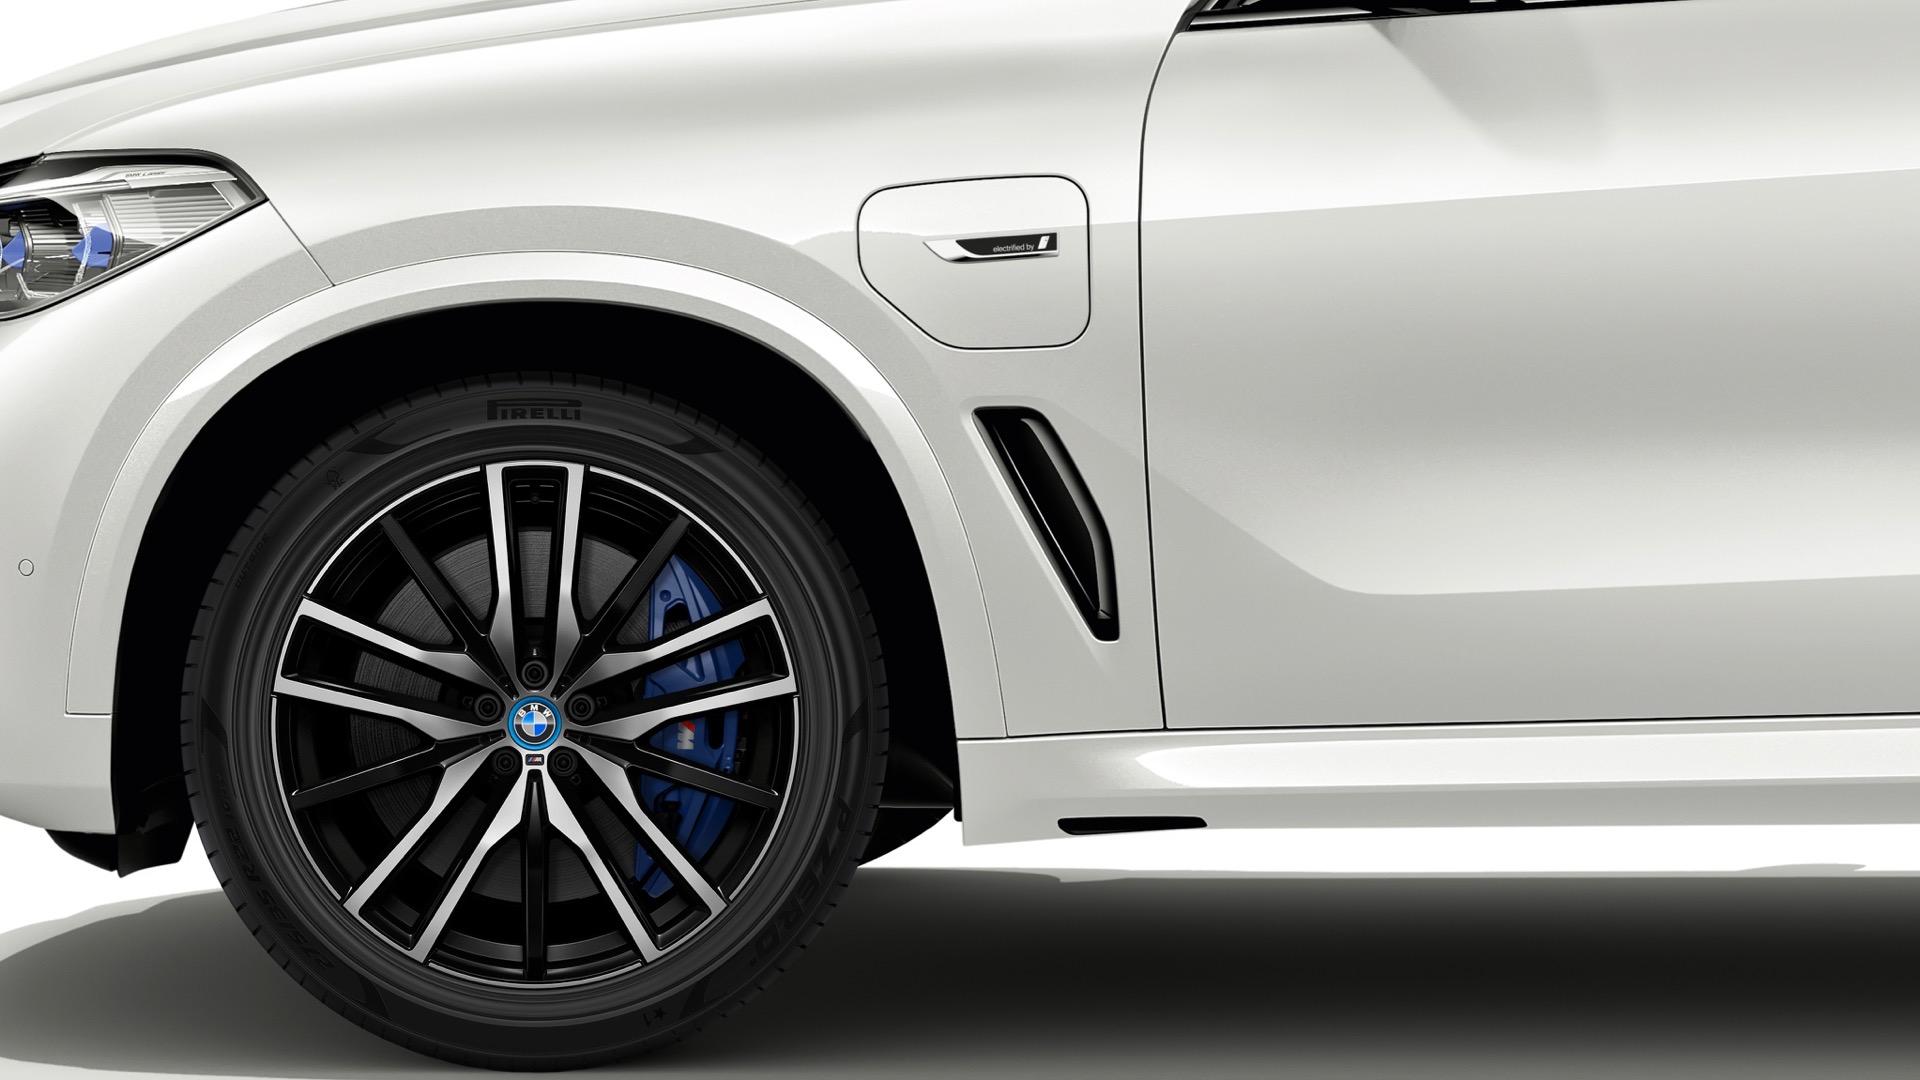 Bmw X5 Xdrive45e With Fsc Certified Pirelli P Zero Tires 100792094 H